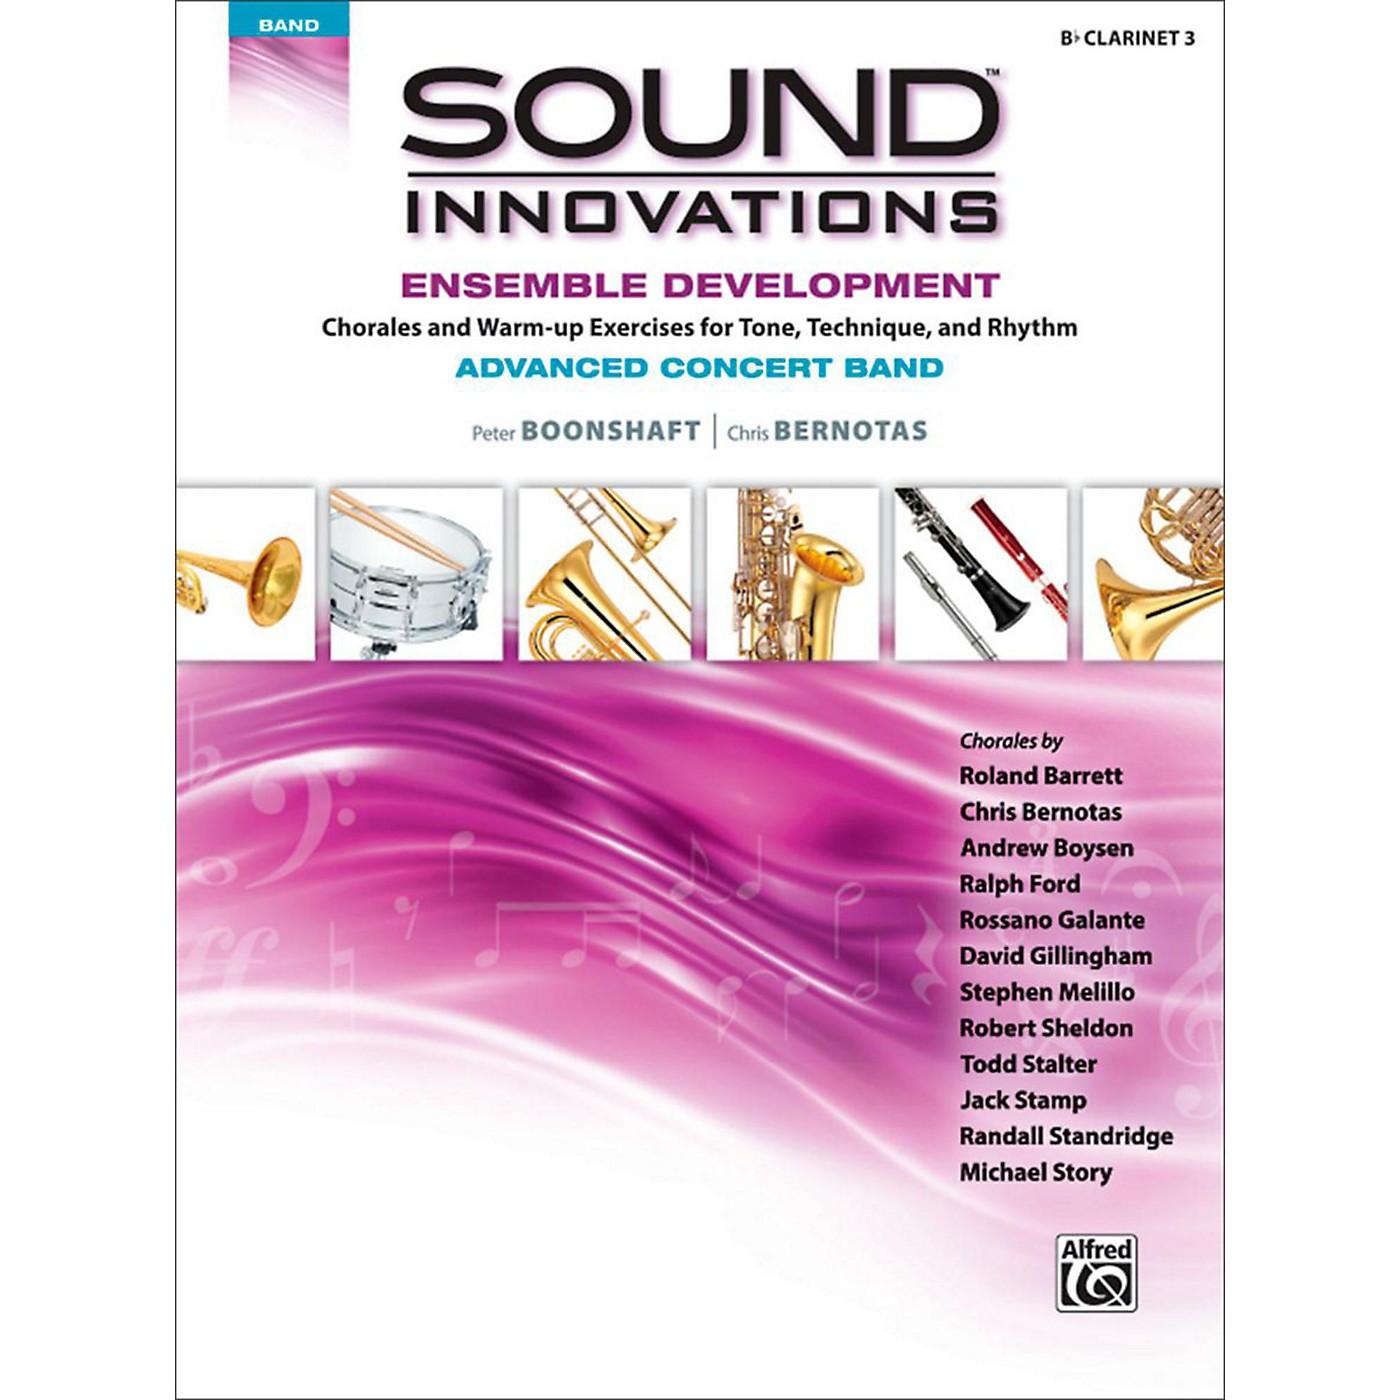 Alfred Sound Innovations Concert Band Ensemble Development Advanced Clarinet 3 thumbnail